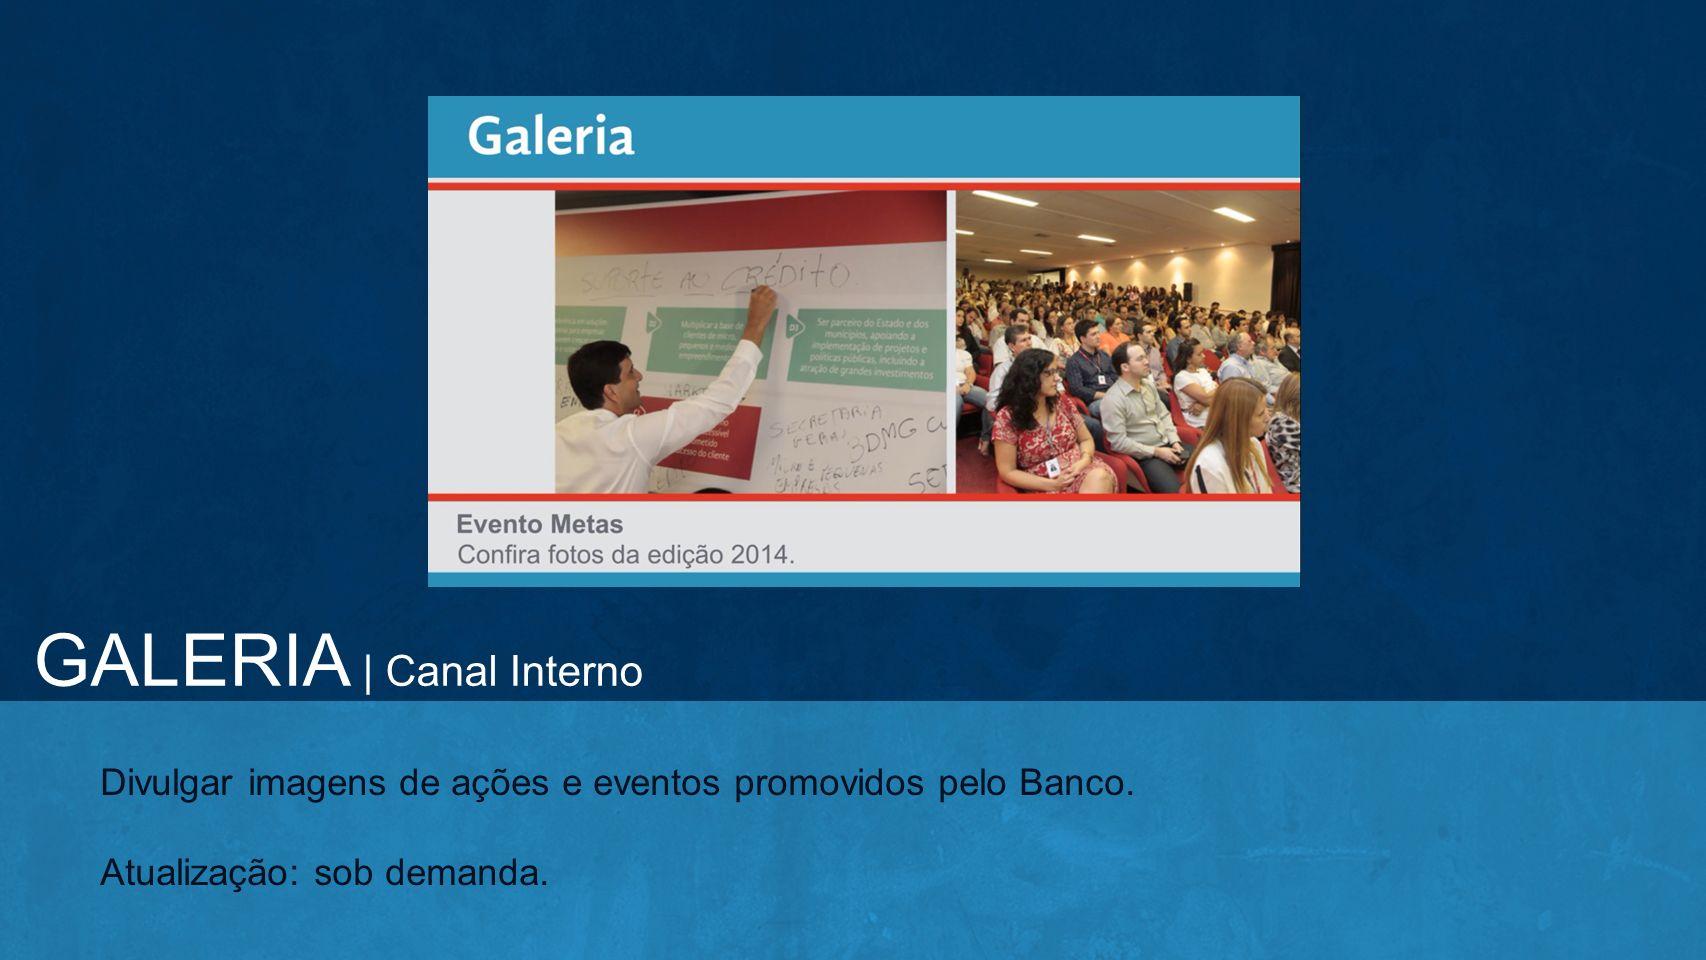 GALERIA | Canal Interno